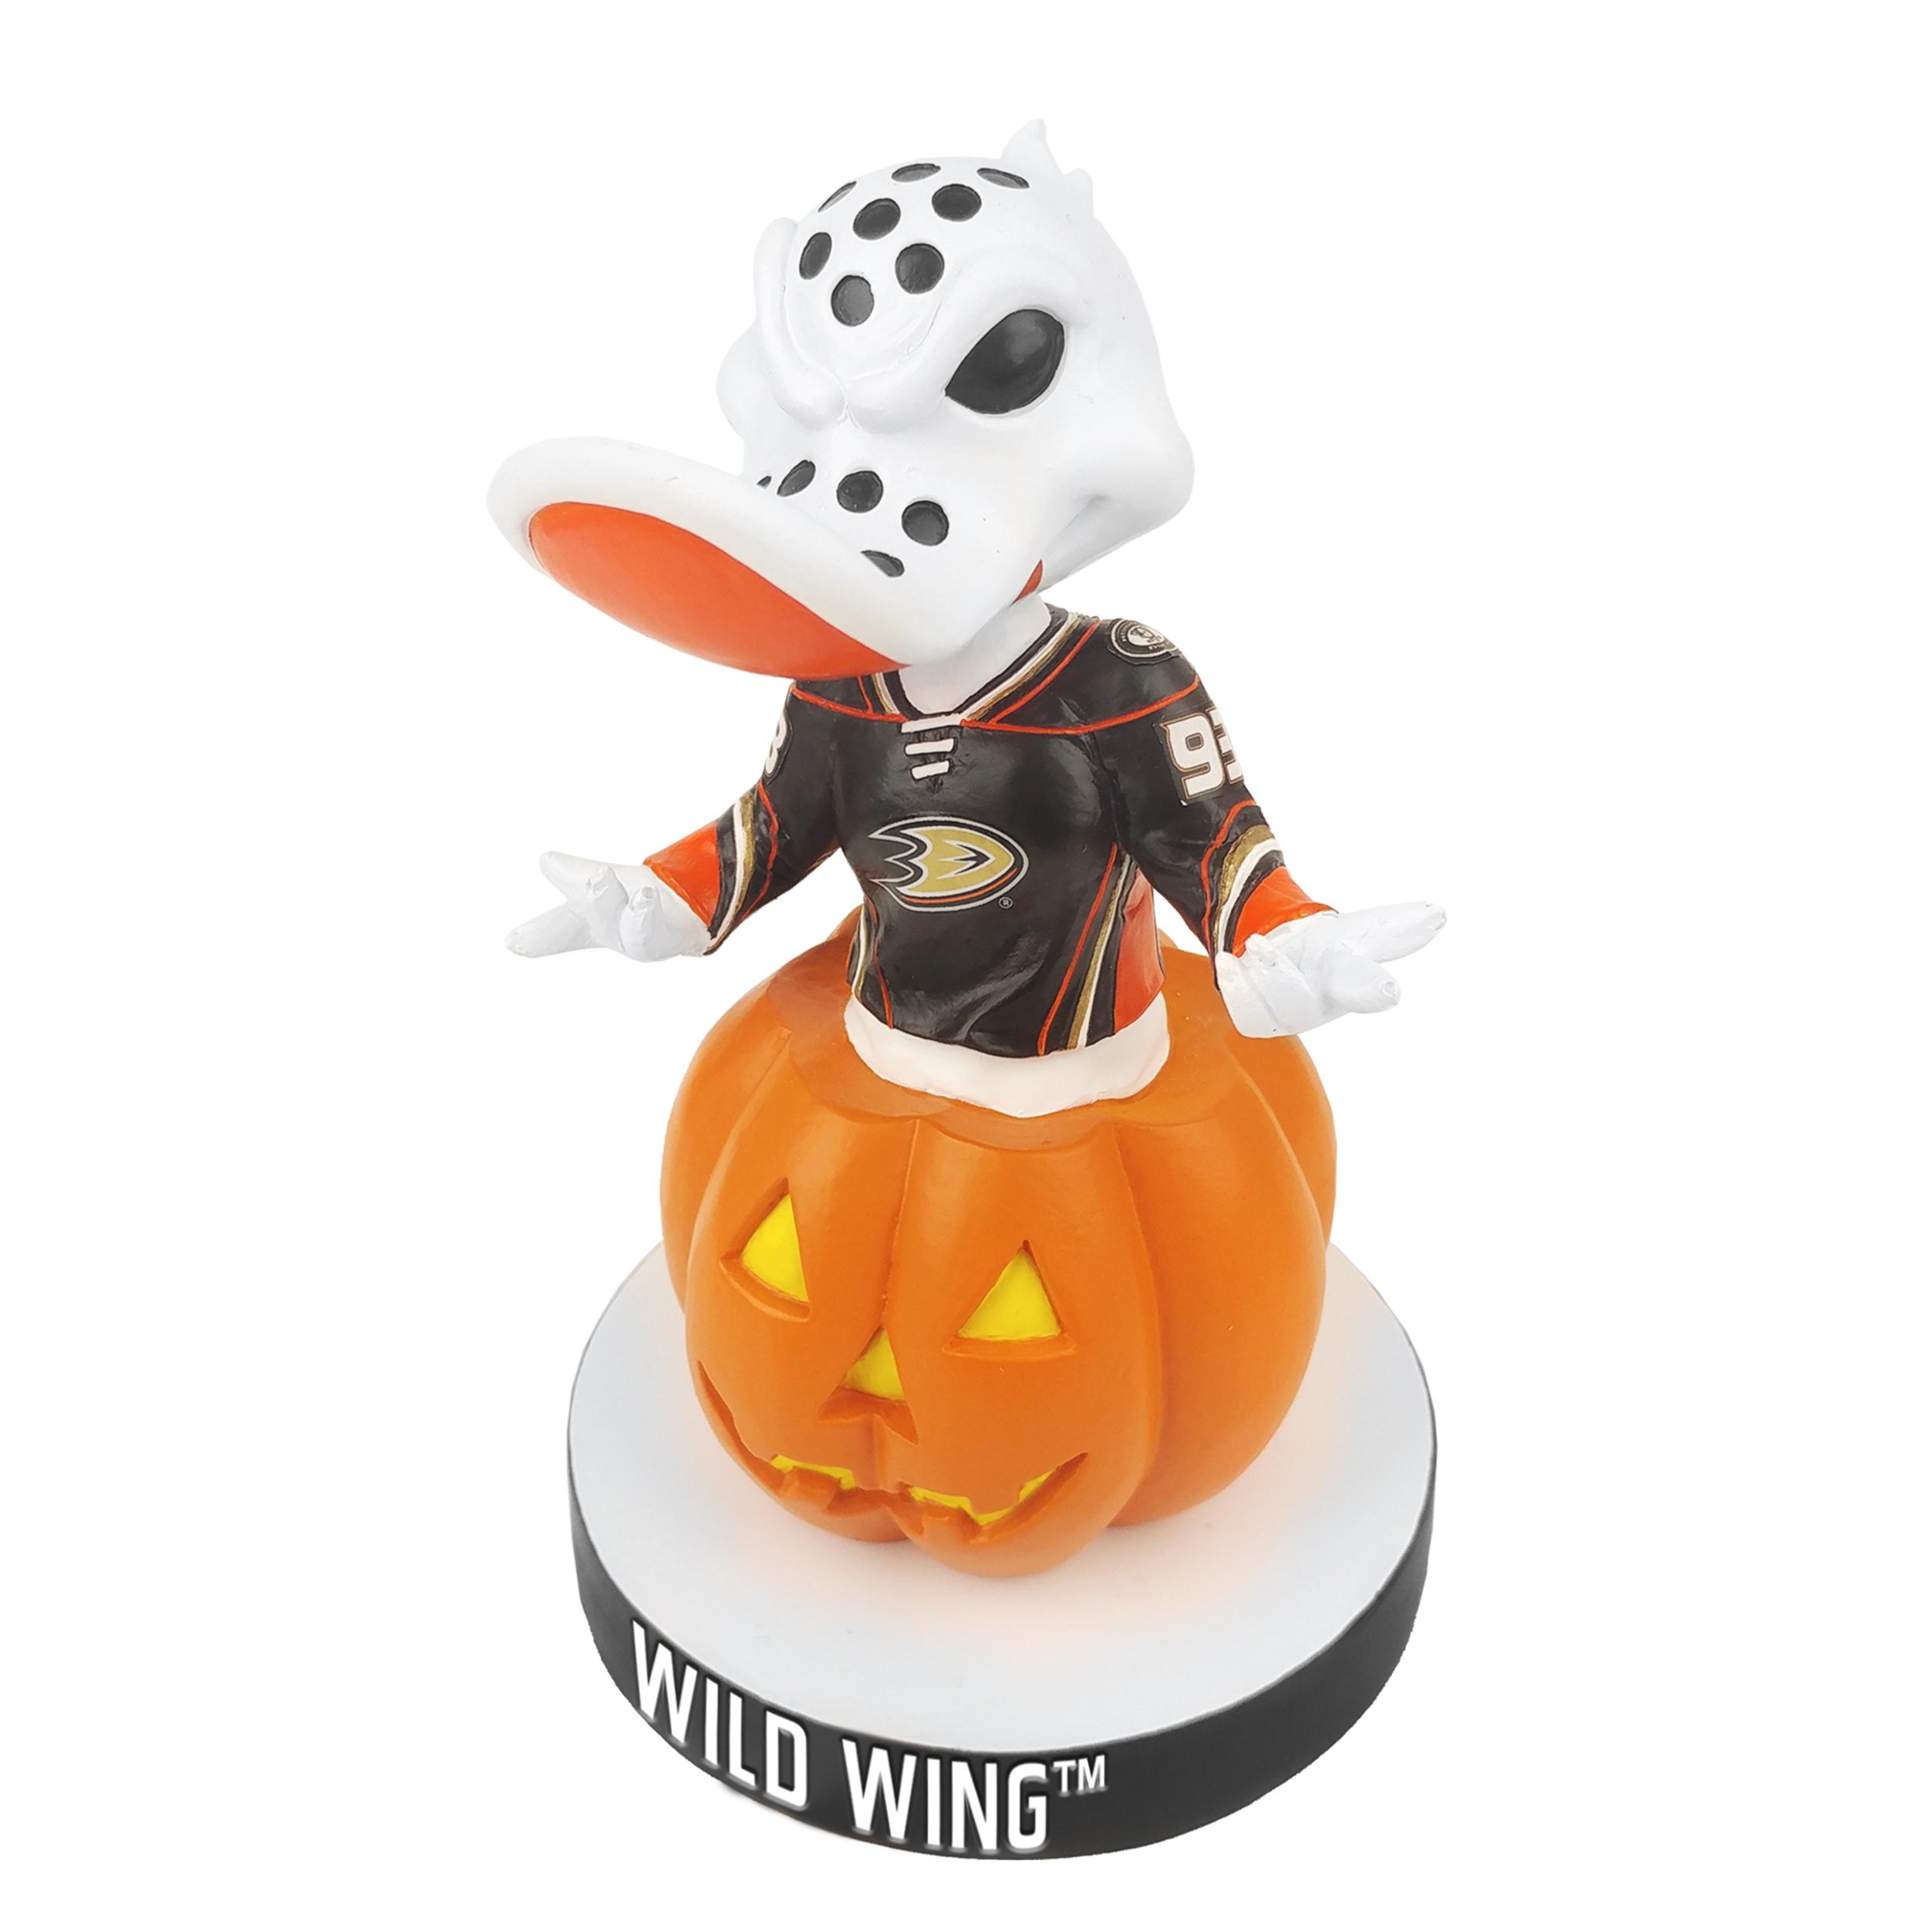 Wild Wing Halloween Bobblehead